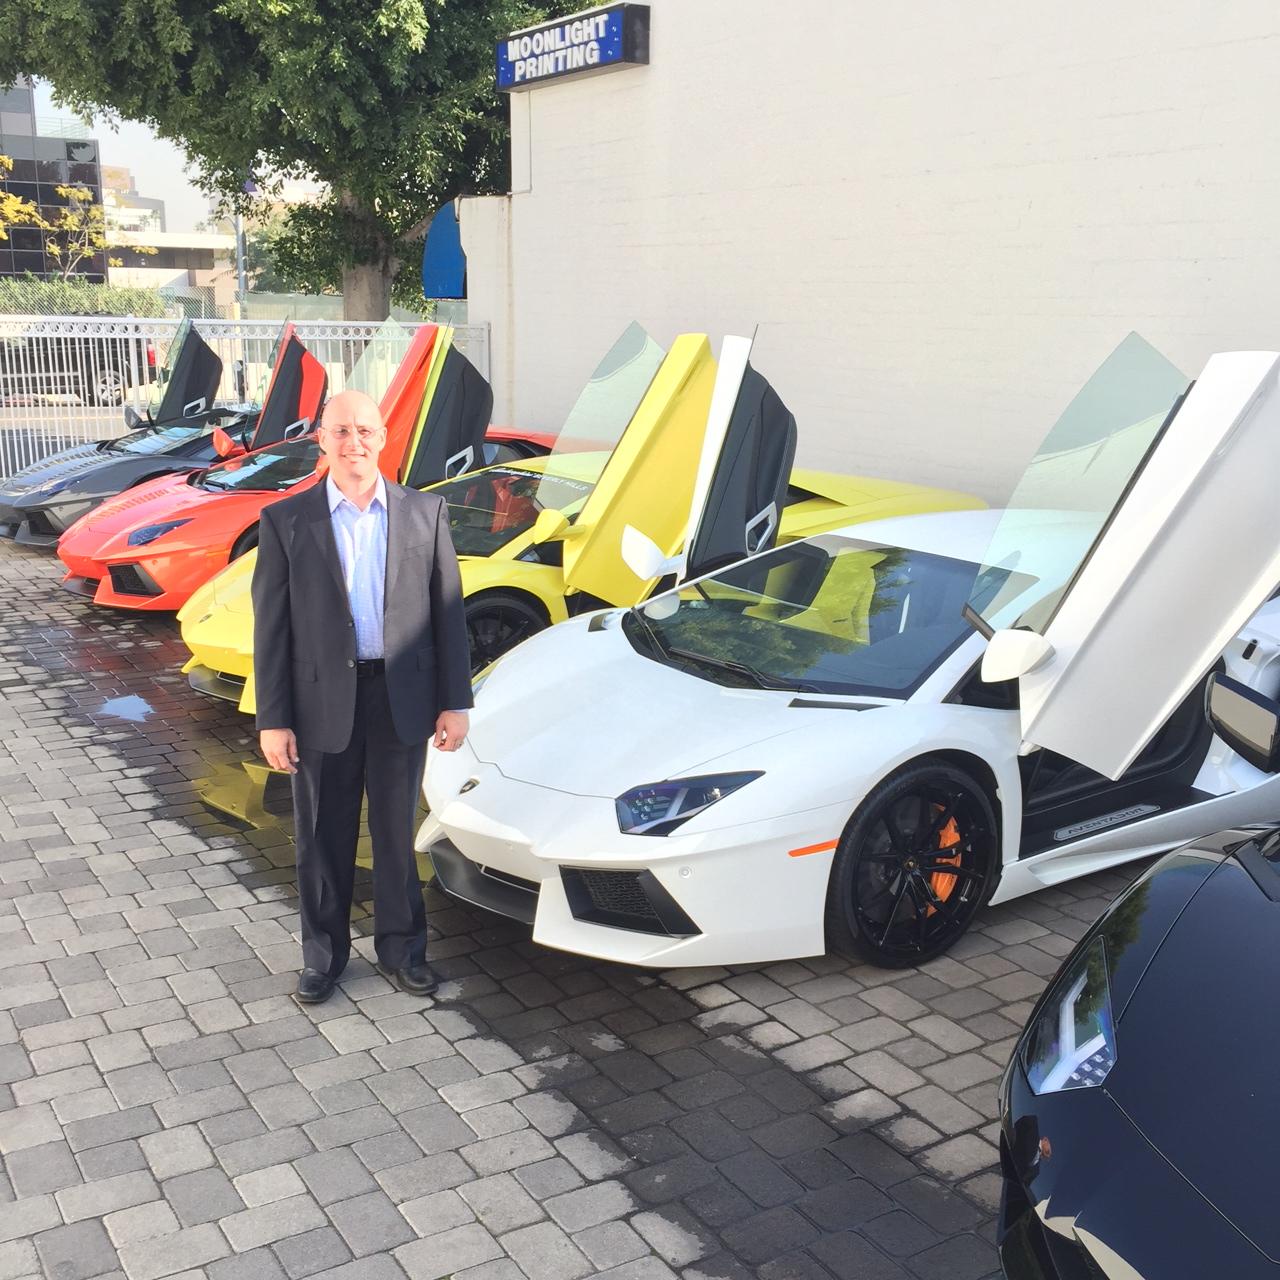 Lamborghini Beverly Hills Vrooms To Elite Thermal Club